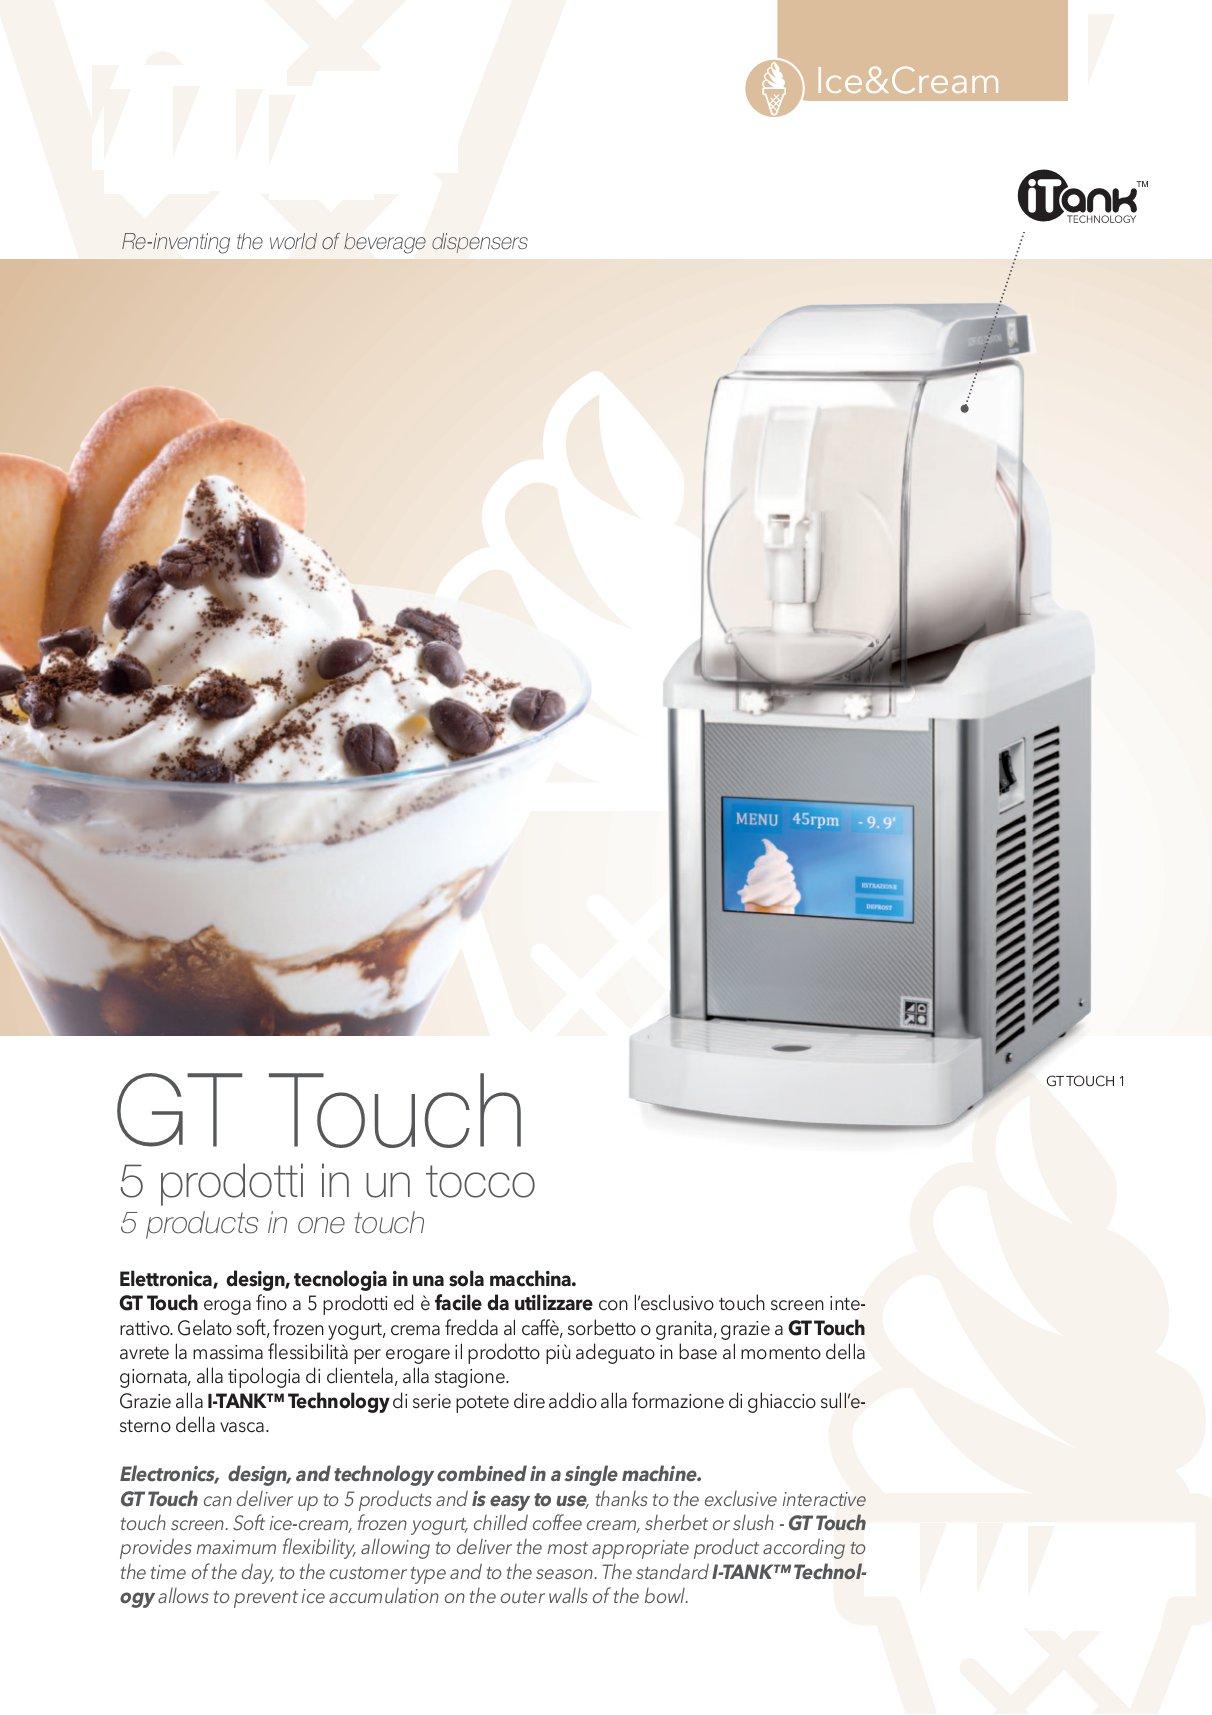 Ricetta Yogurt Per Macchina Soft.Gt Touch 1 Per Gelato Soft Granite Sorbetti Frozen Yogurt Attrezzature Ed Arredamenti Per Alberghi